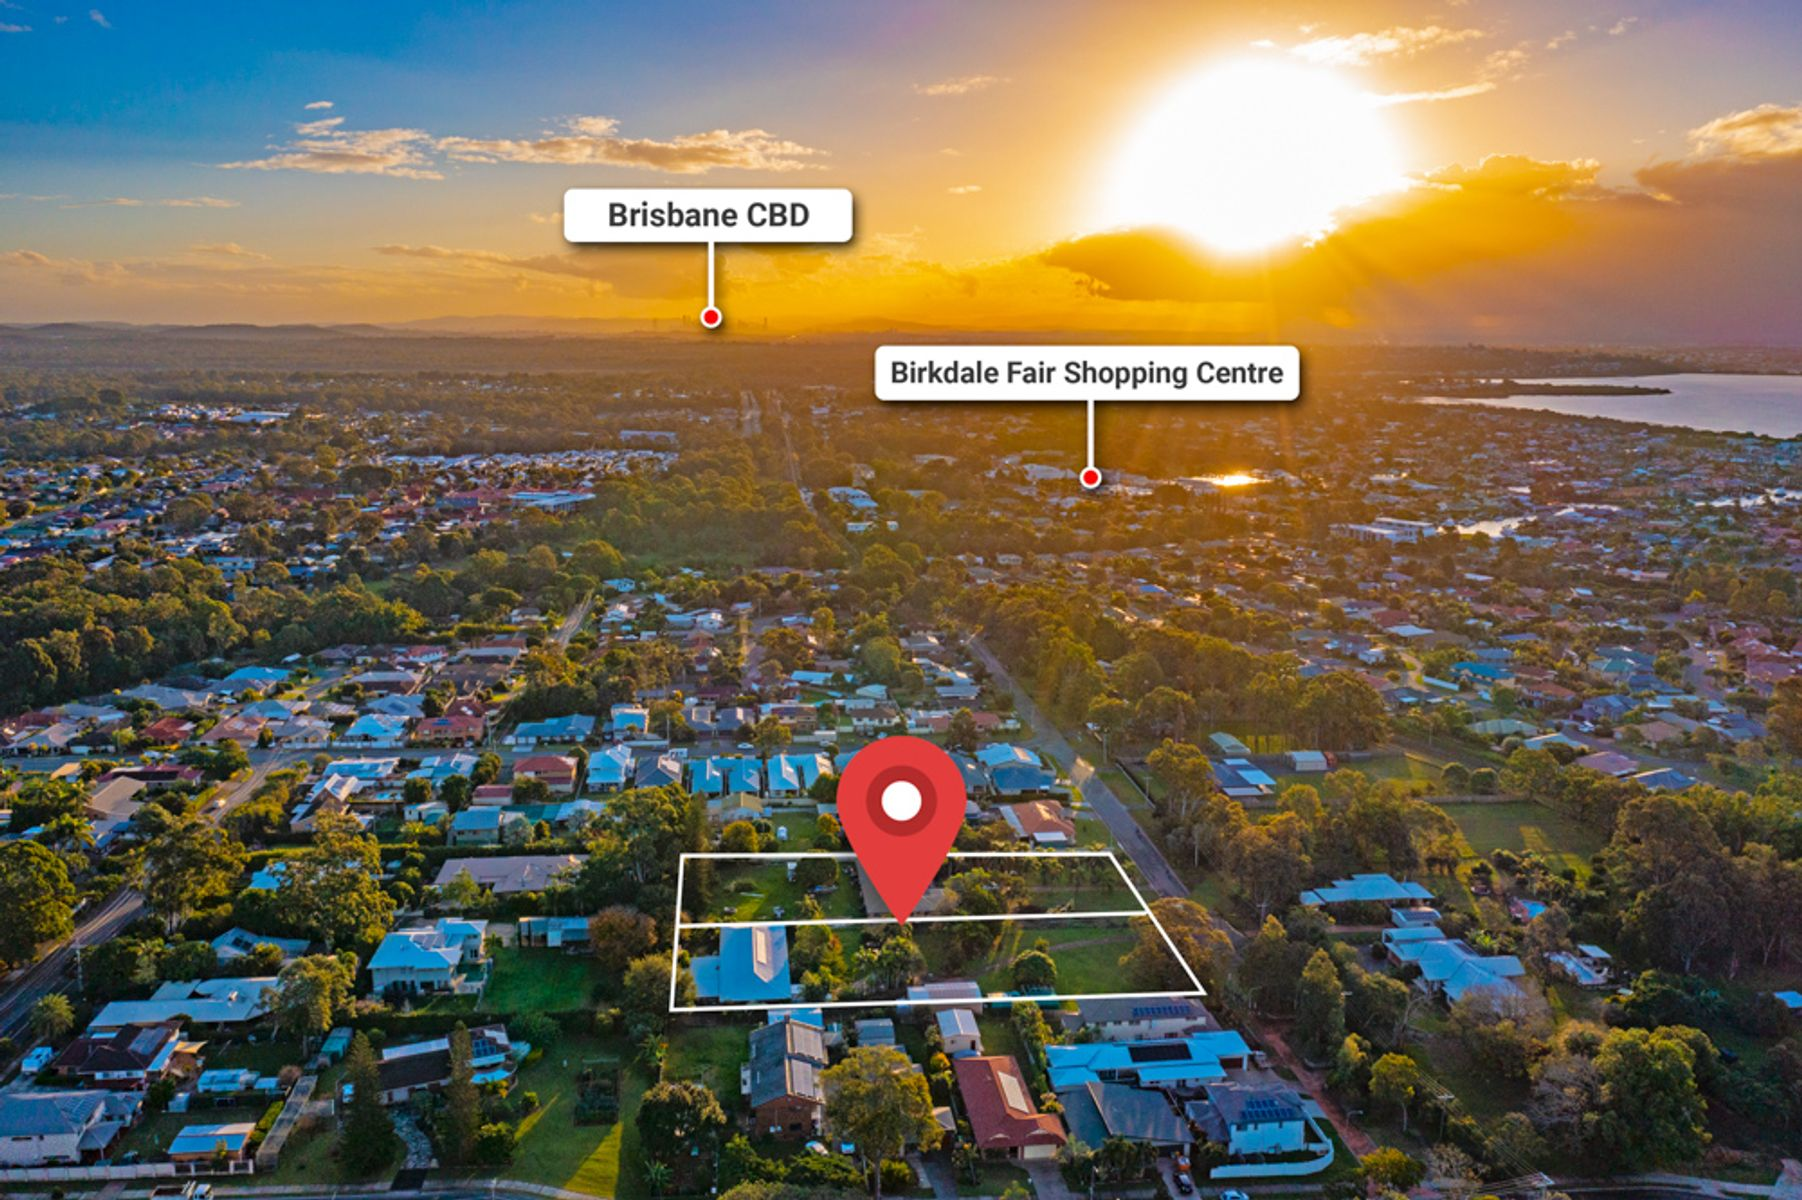 6-12 Pandanus Street, Birkdale, QLD 4159